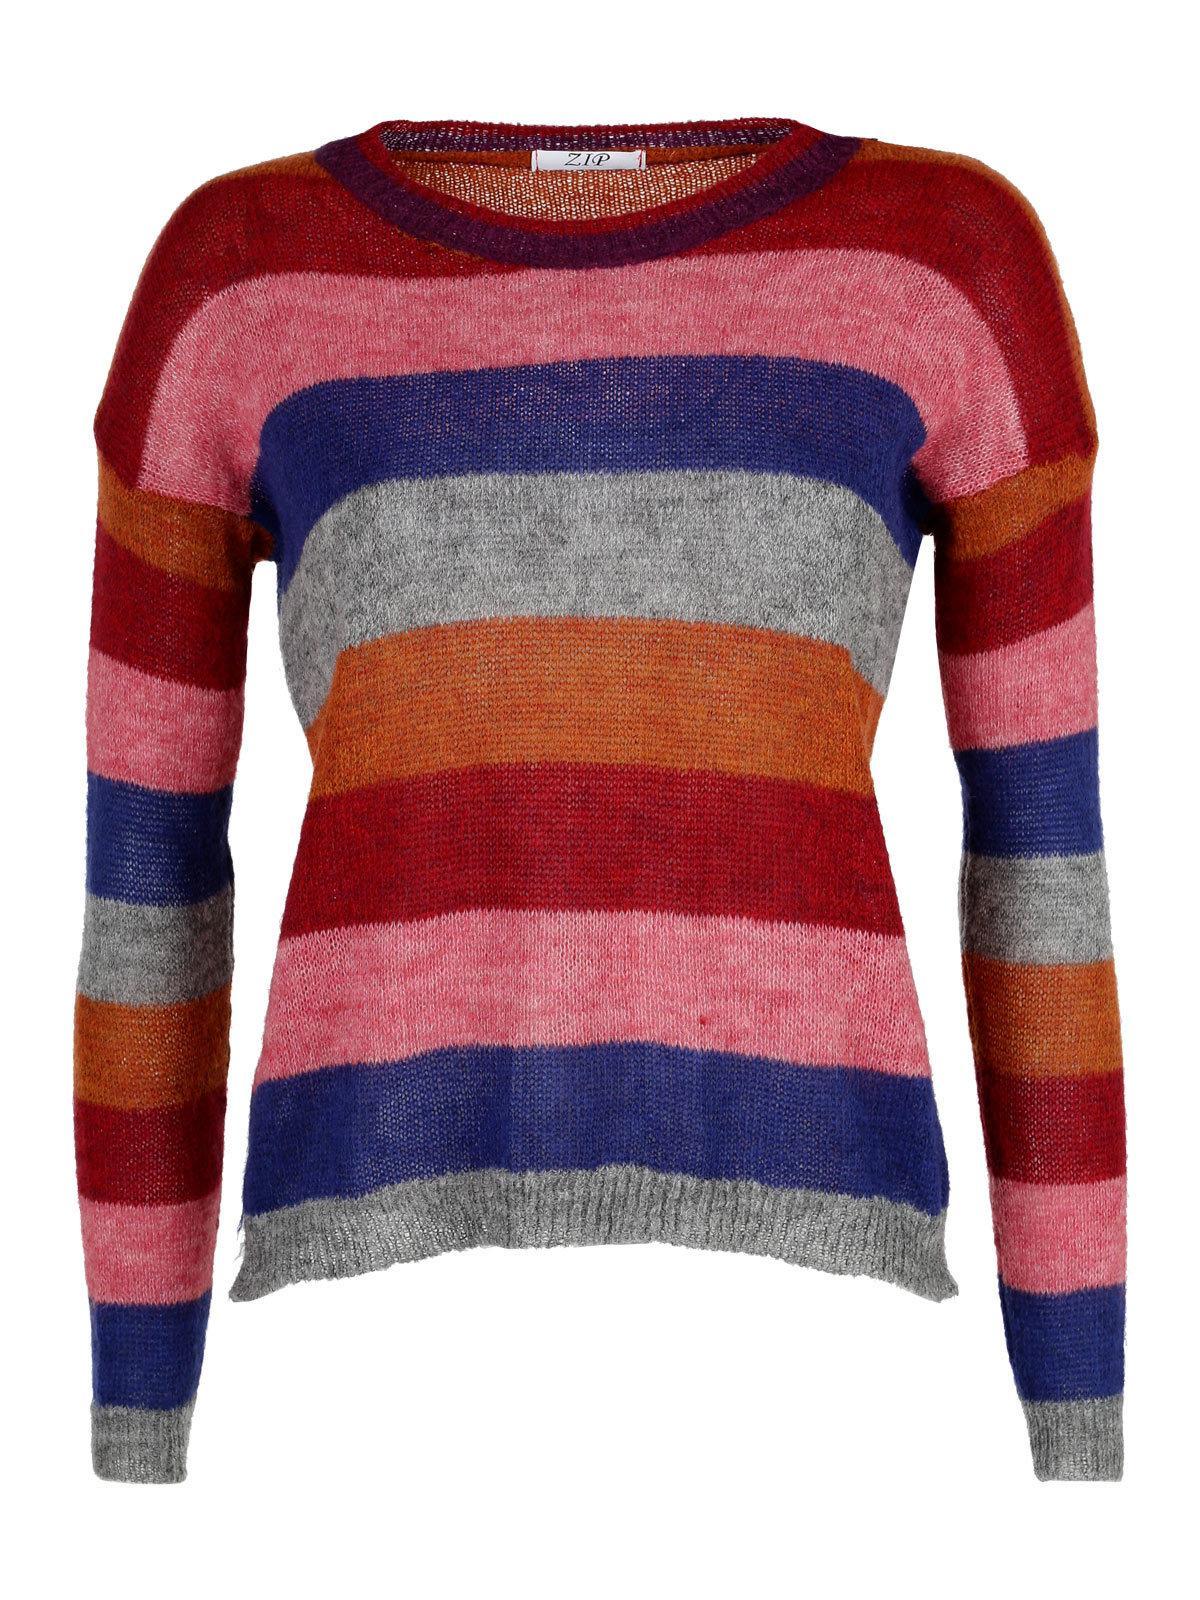 Maglione misto lana a righe zip | MecShopping